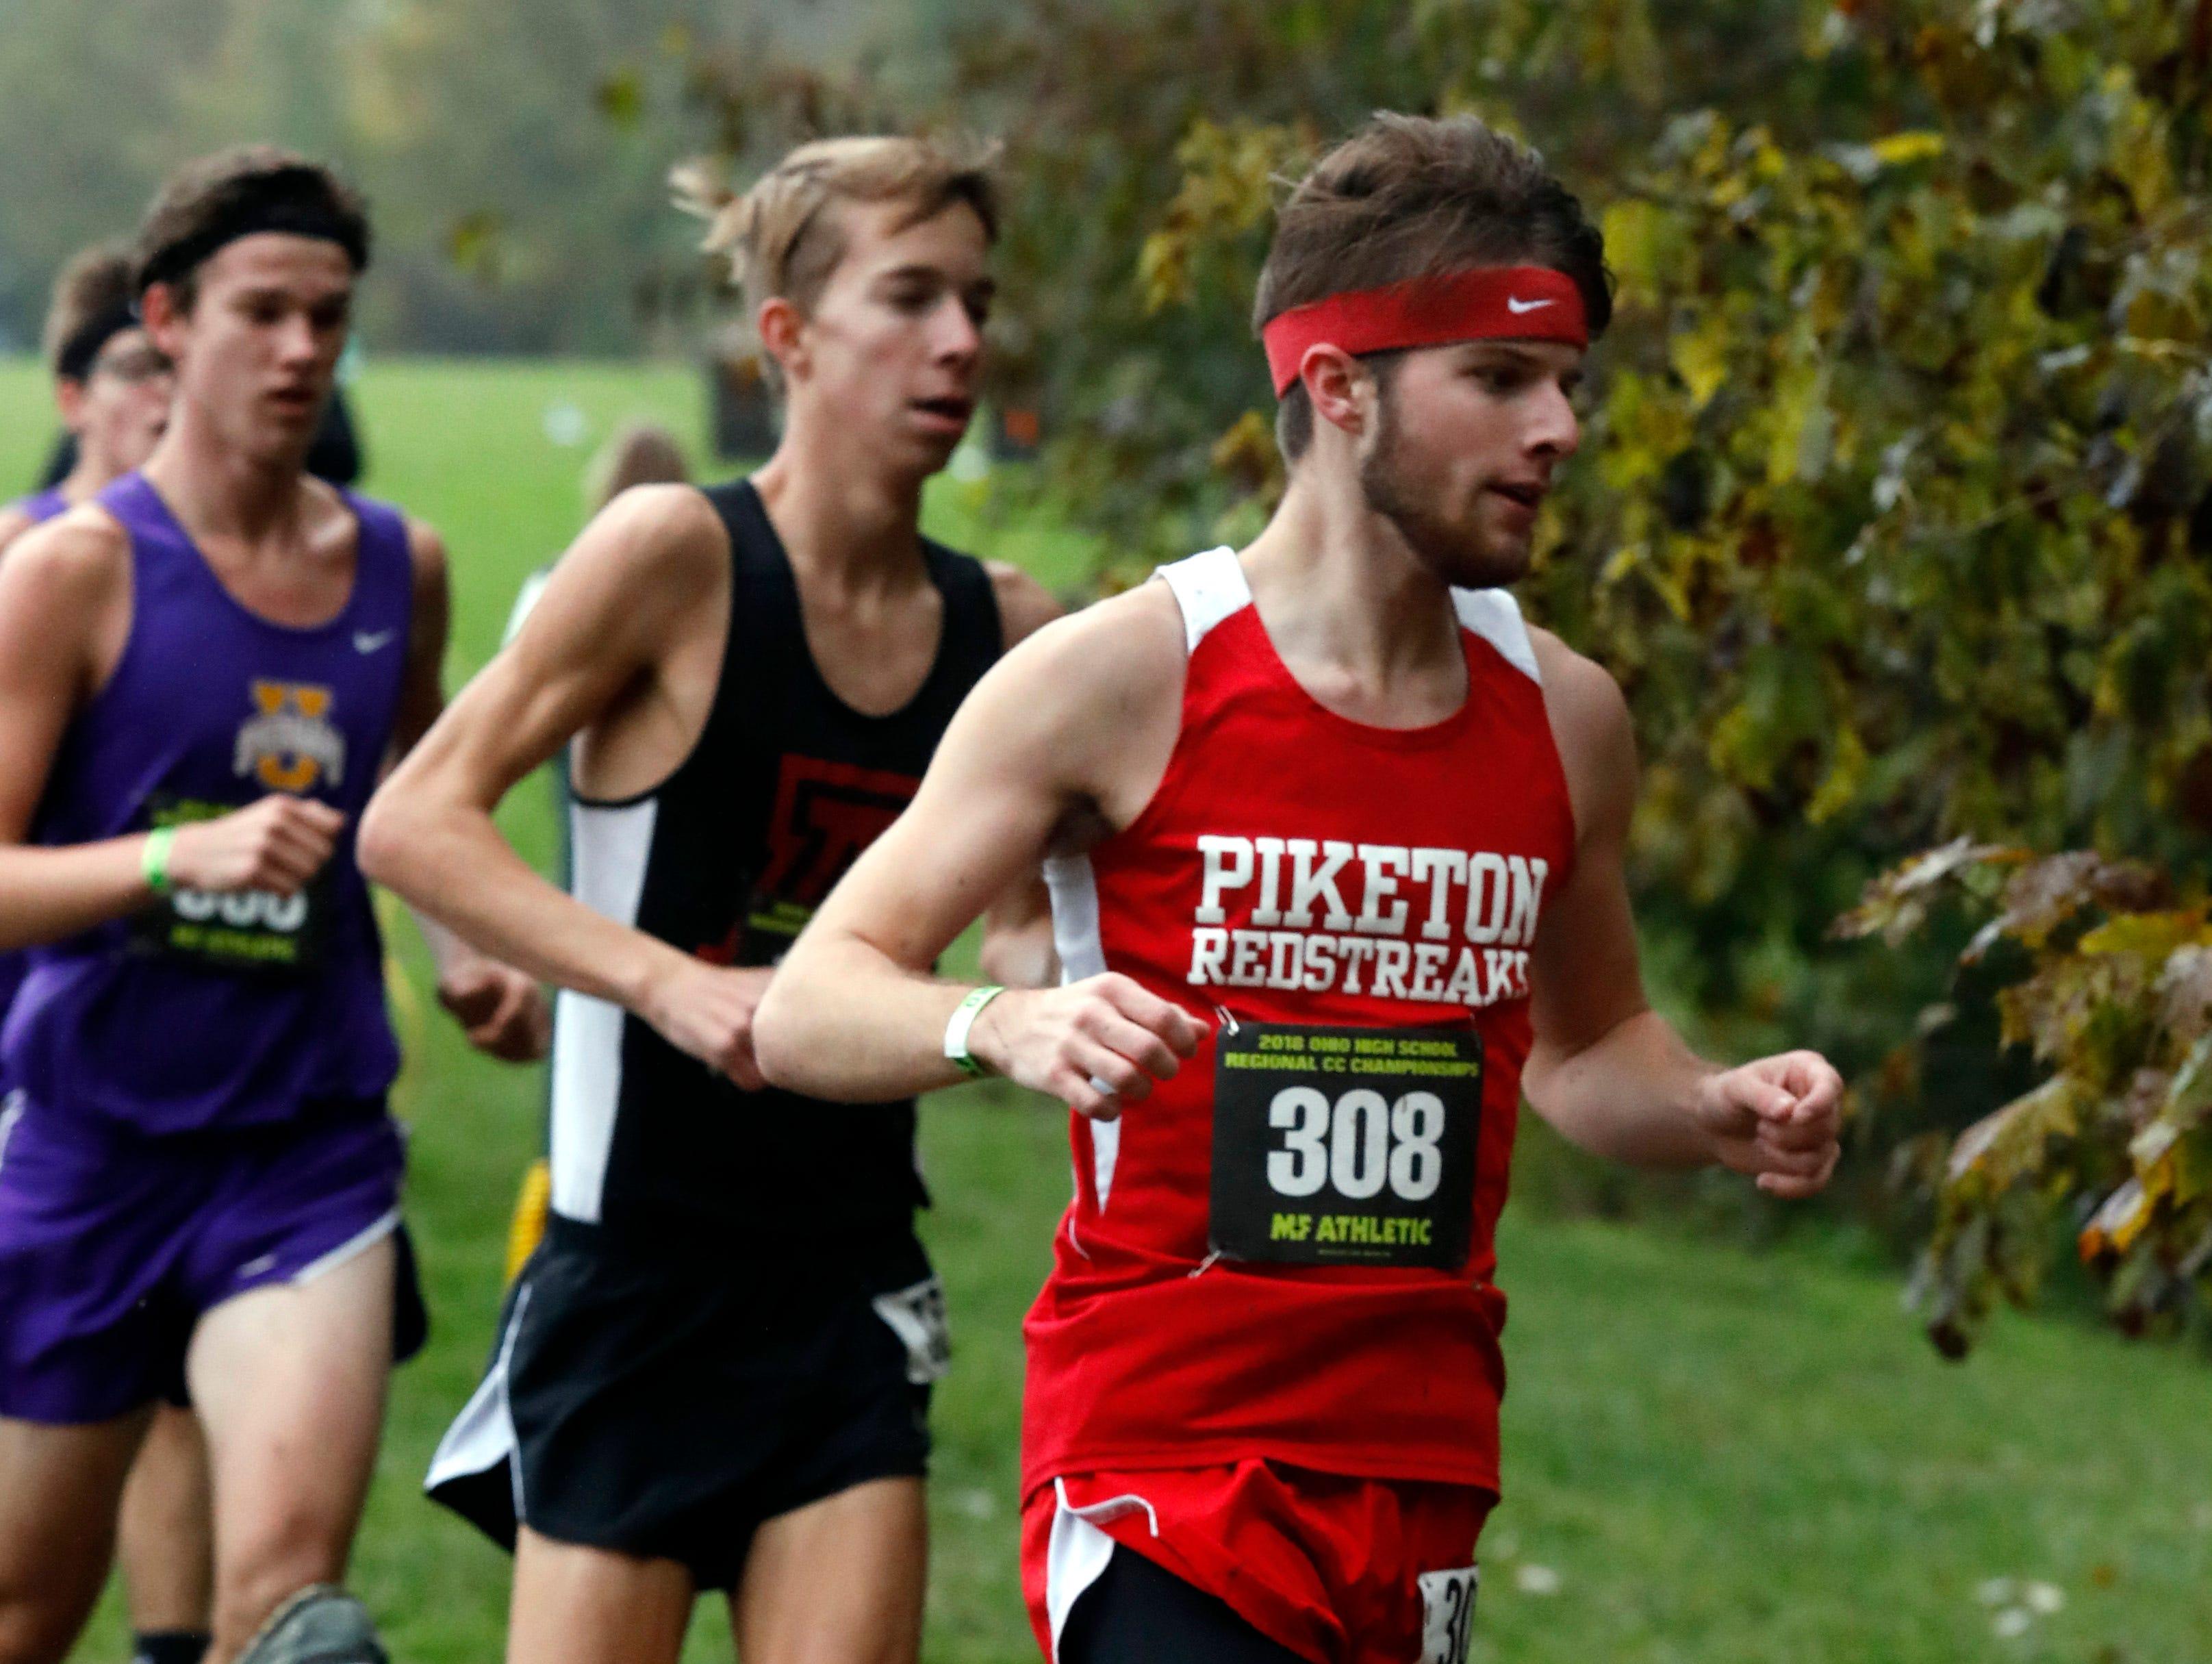 Piketon's Jaret Klinker runs in the Regional Cross Country meet Saturday, Oct. 27, 2018, at Pickerington North High School in Pickerington.